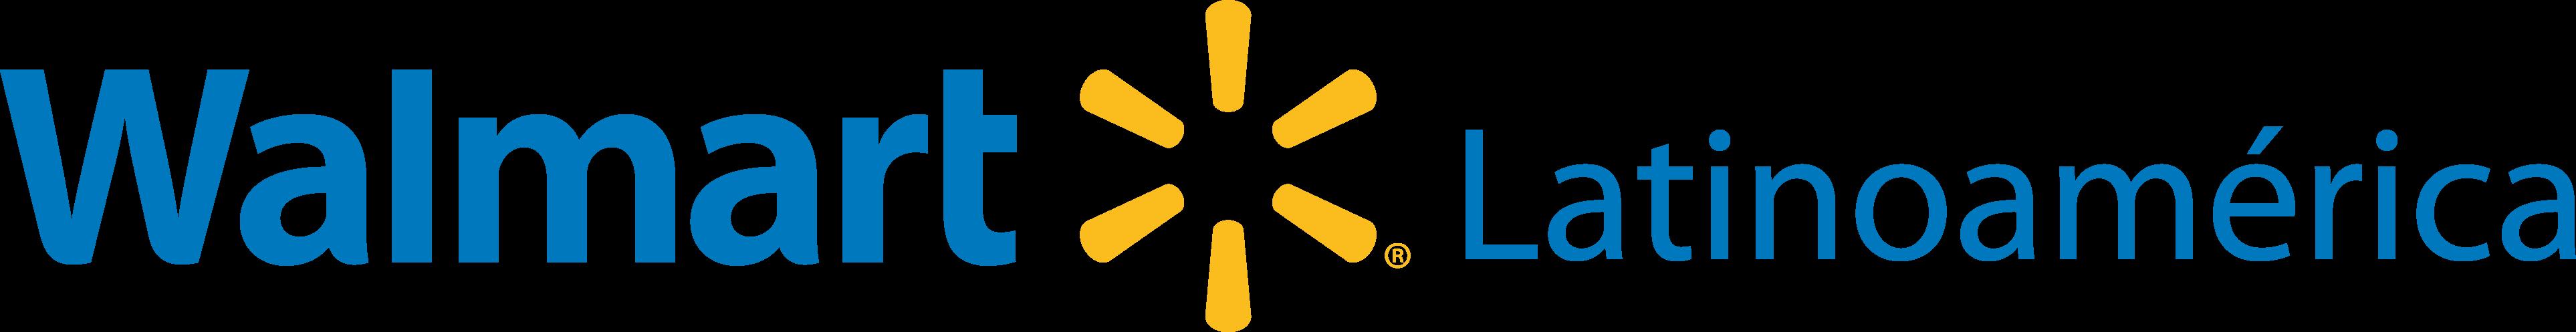 Walmart clipart money jpg stock Walmart Latinoamérica | Logos | Pinterest | Logos jpg stock